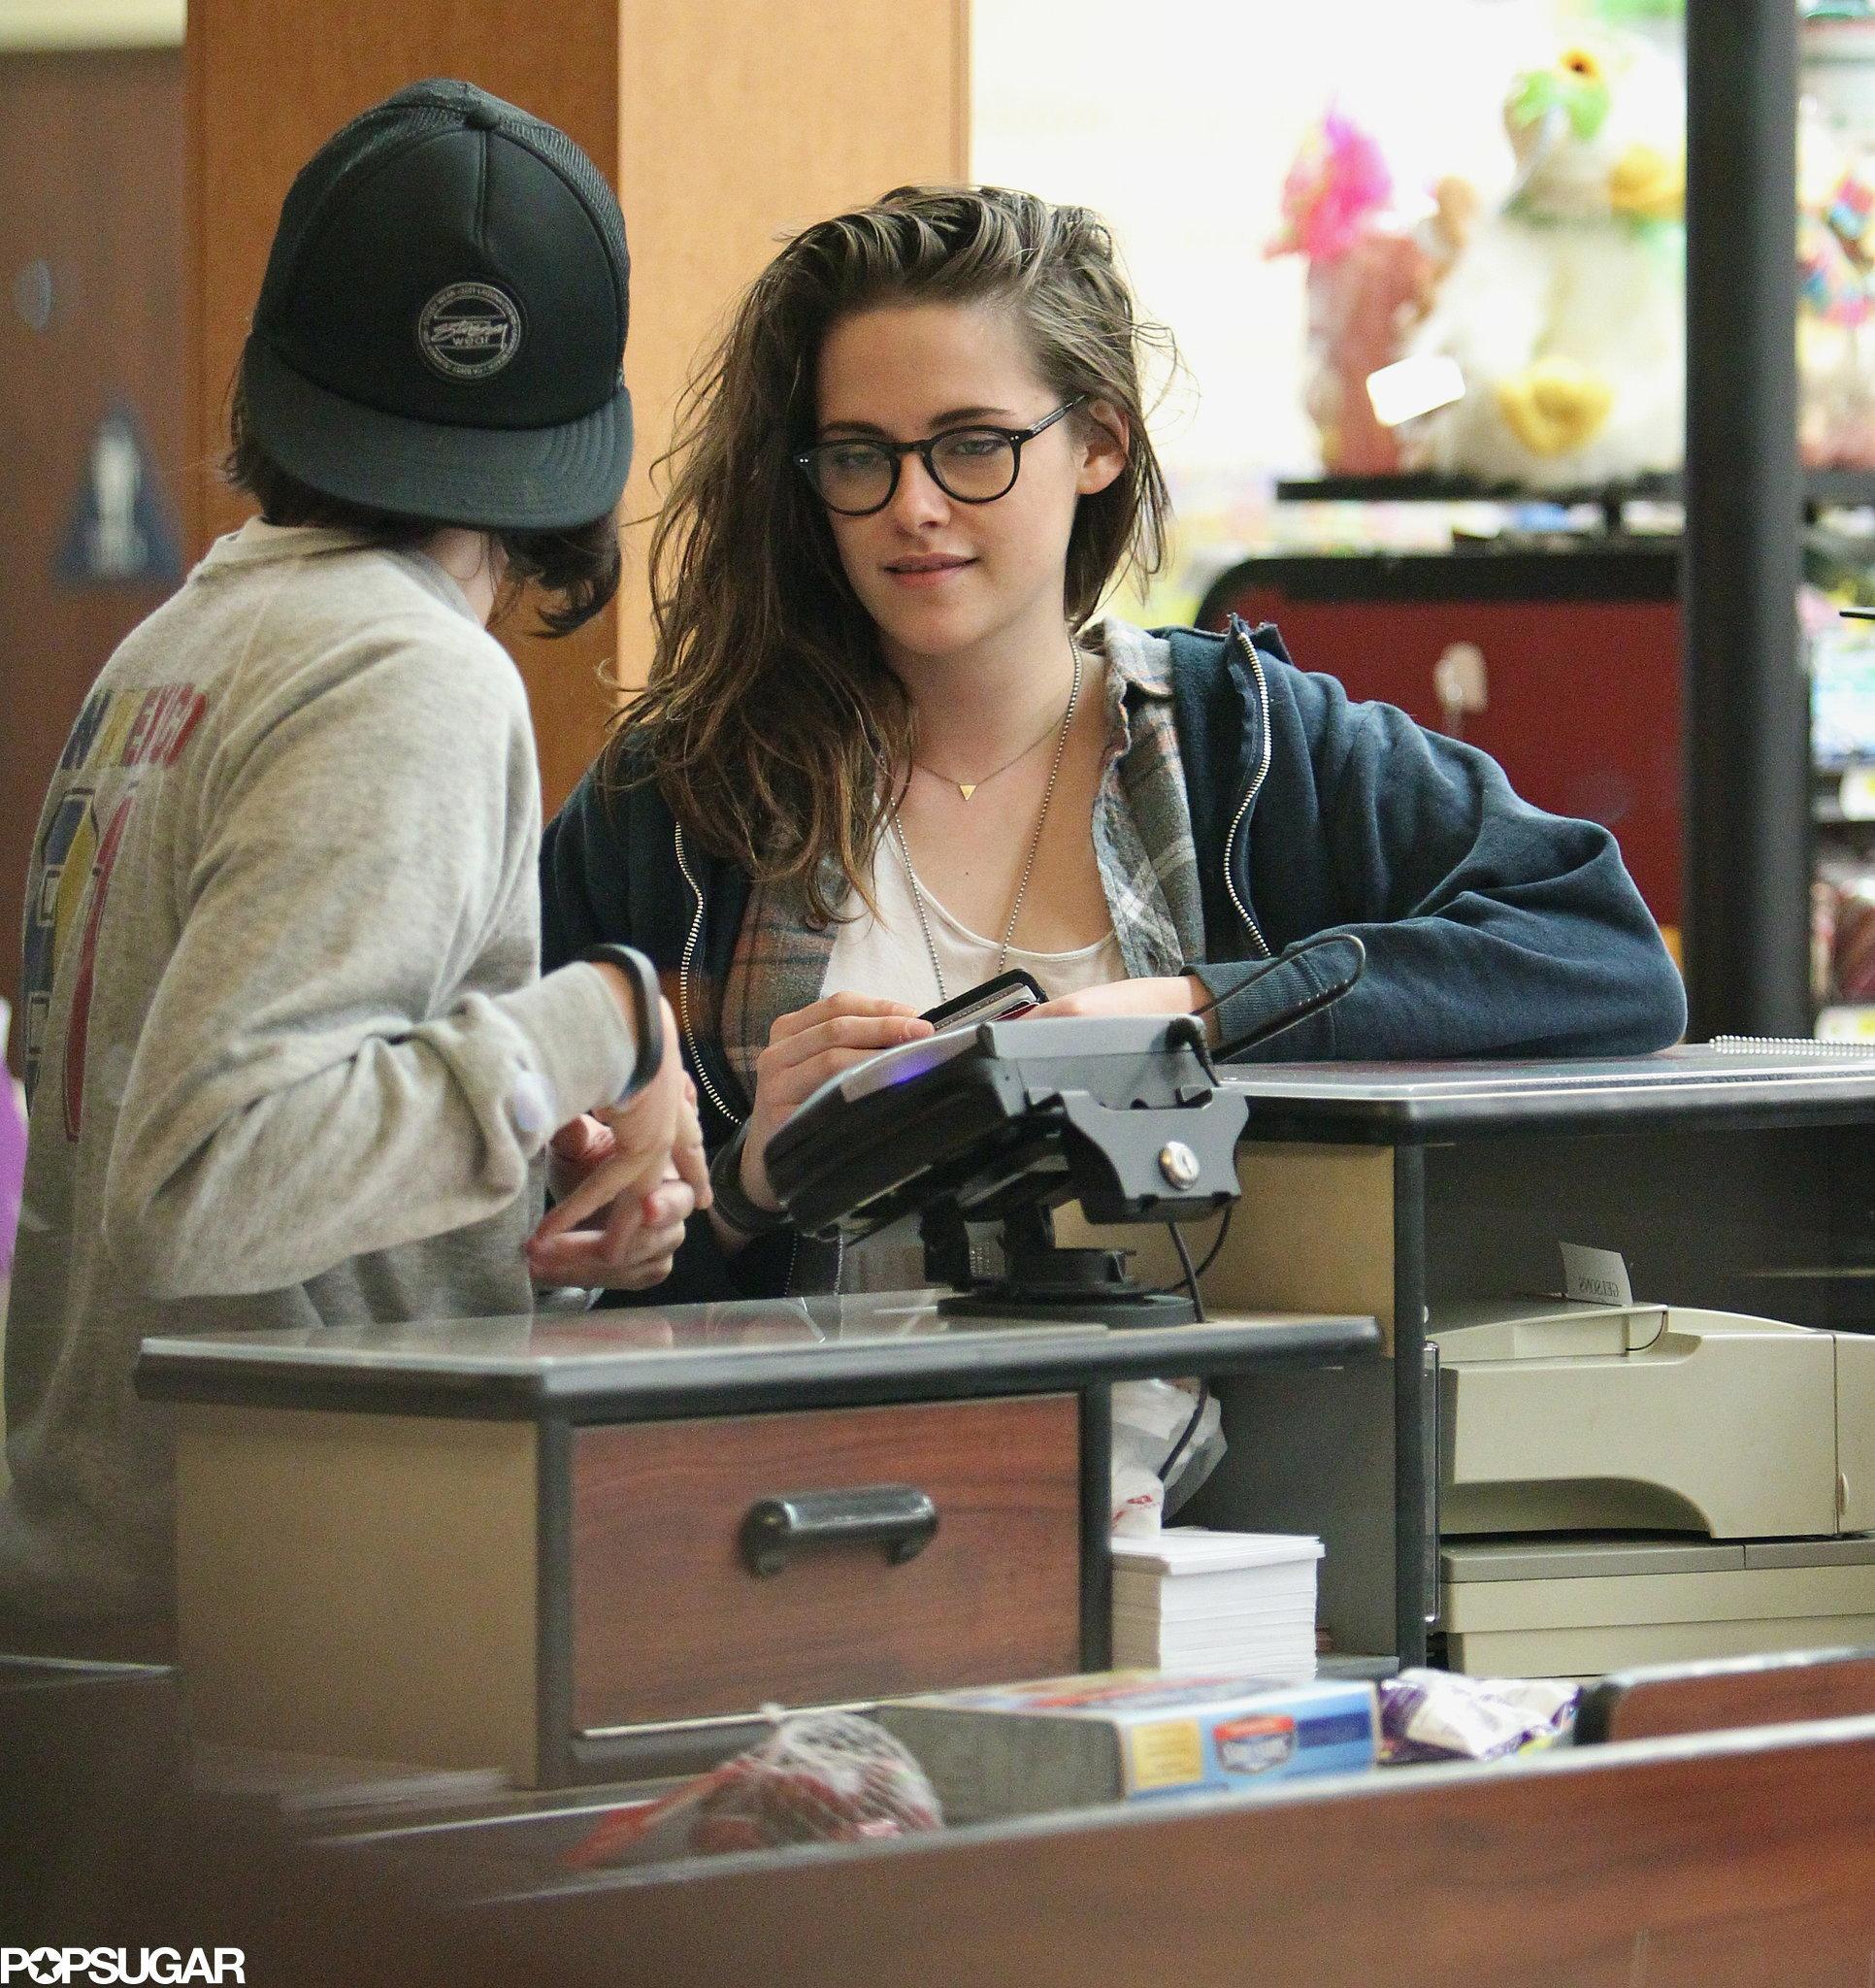 Kristen Stewart Is Back to Her Old LA Routines